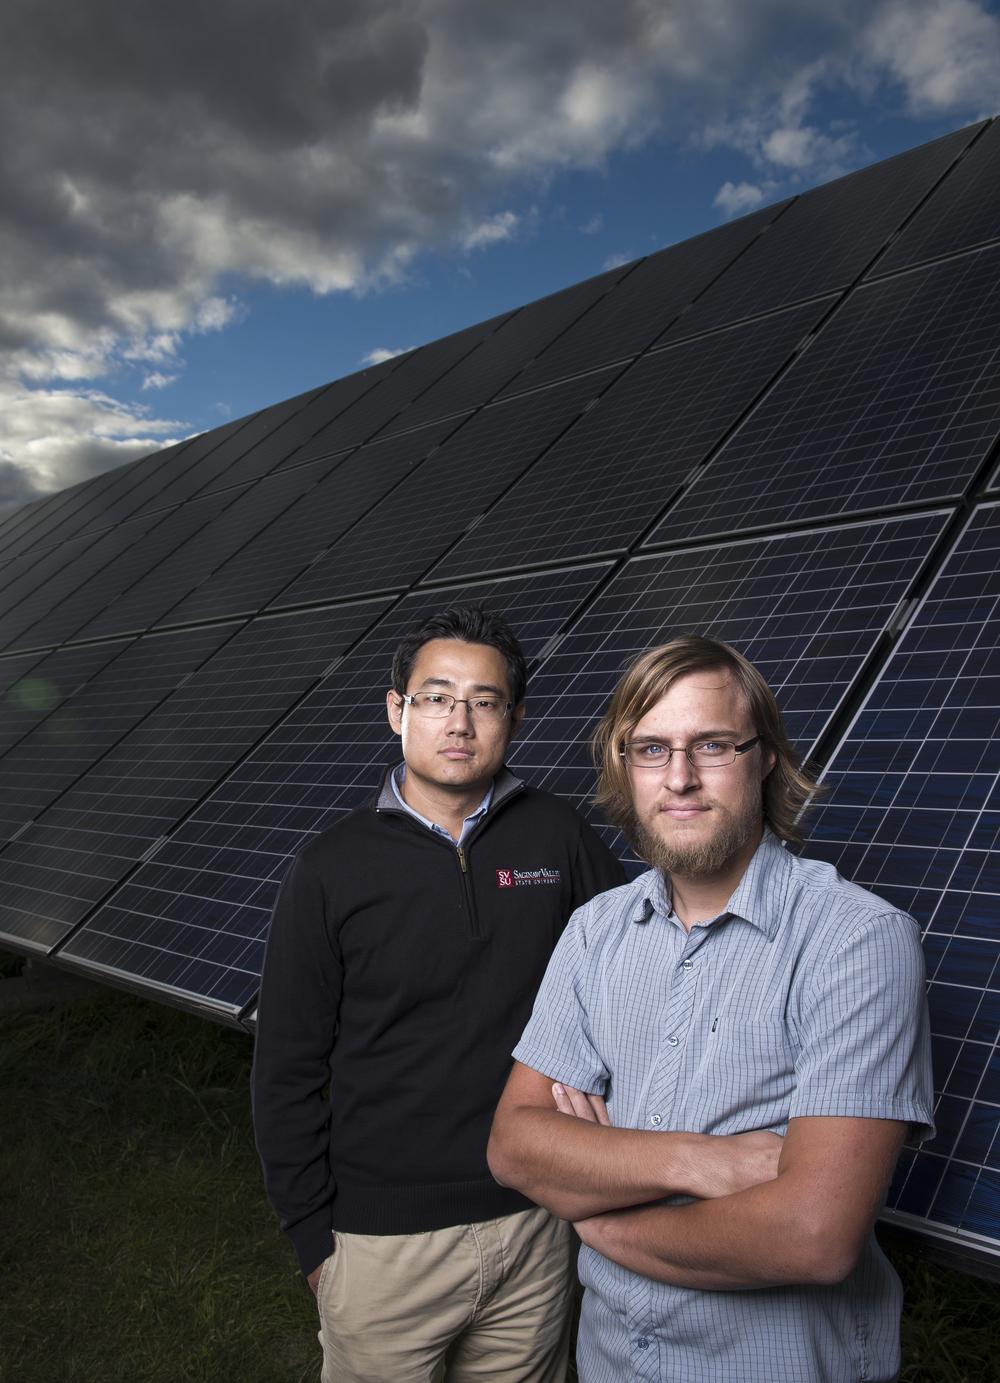 Yu Zou Solar Panels billboard 10-9 by Michael Randolph  DSC_3866.JPG